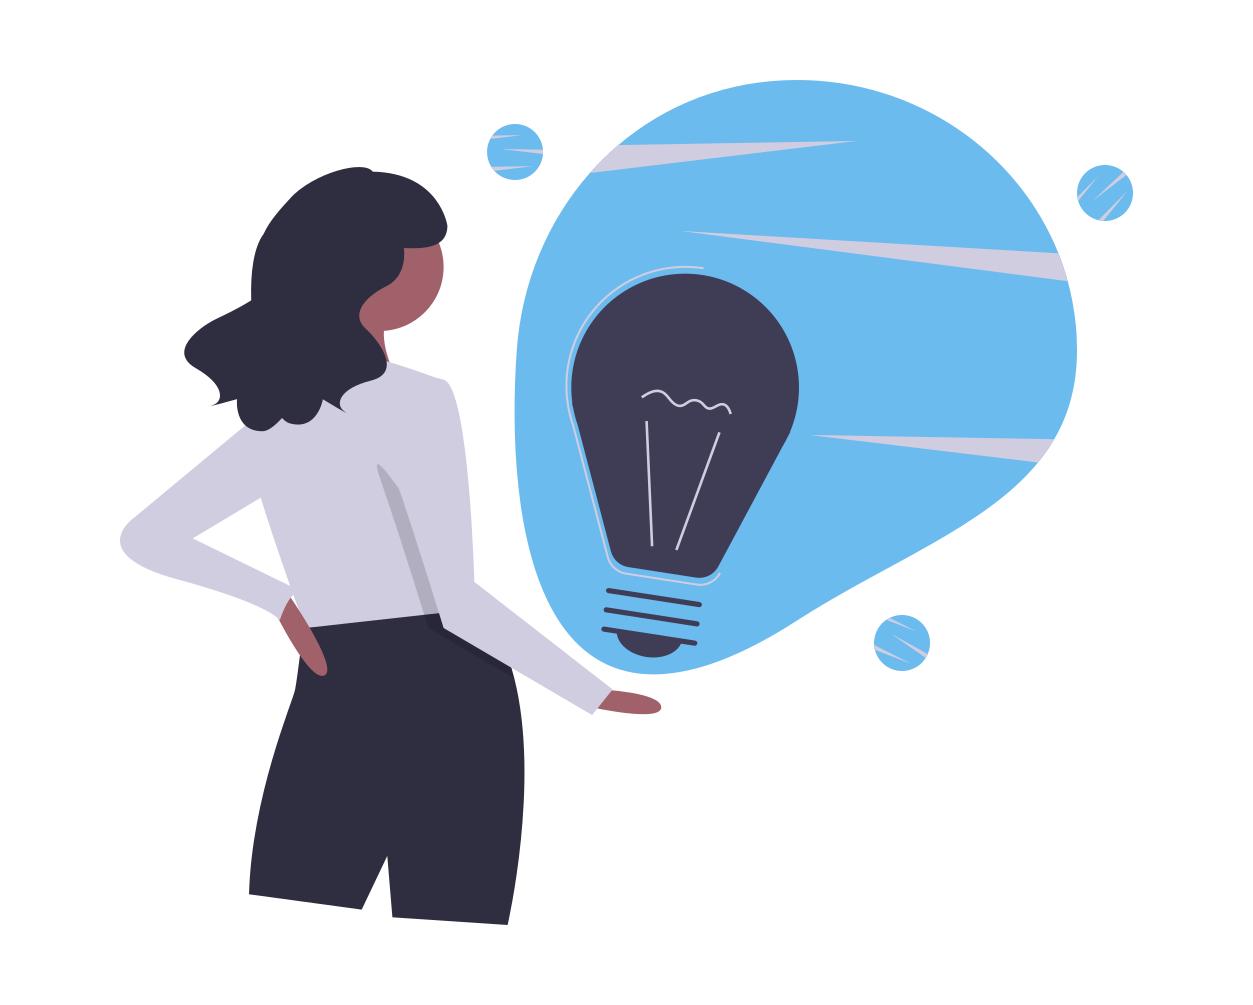 undraw_new_ideas_jdea (1)